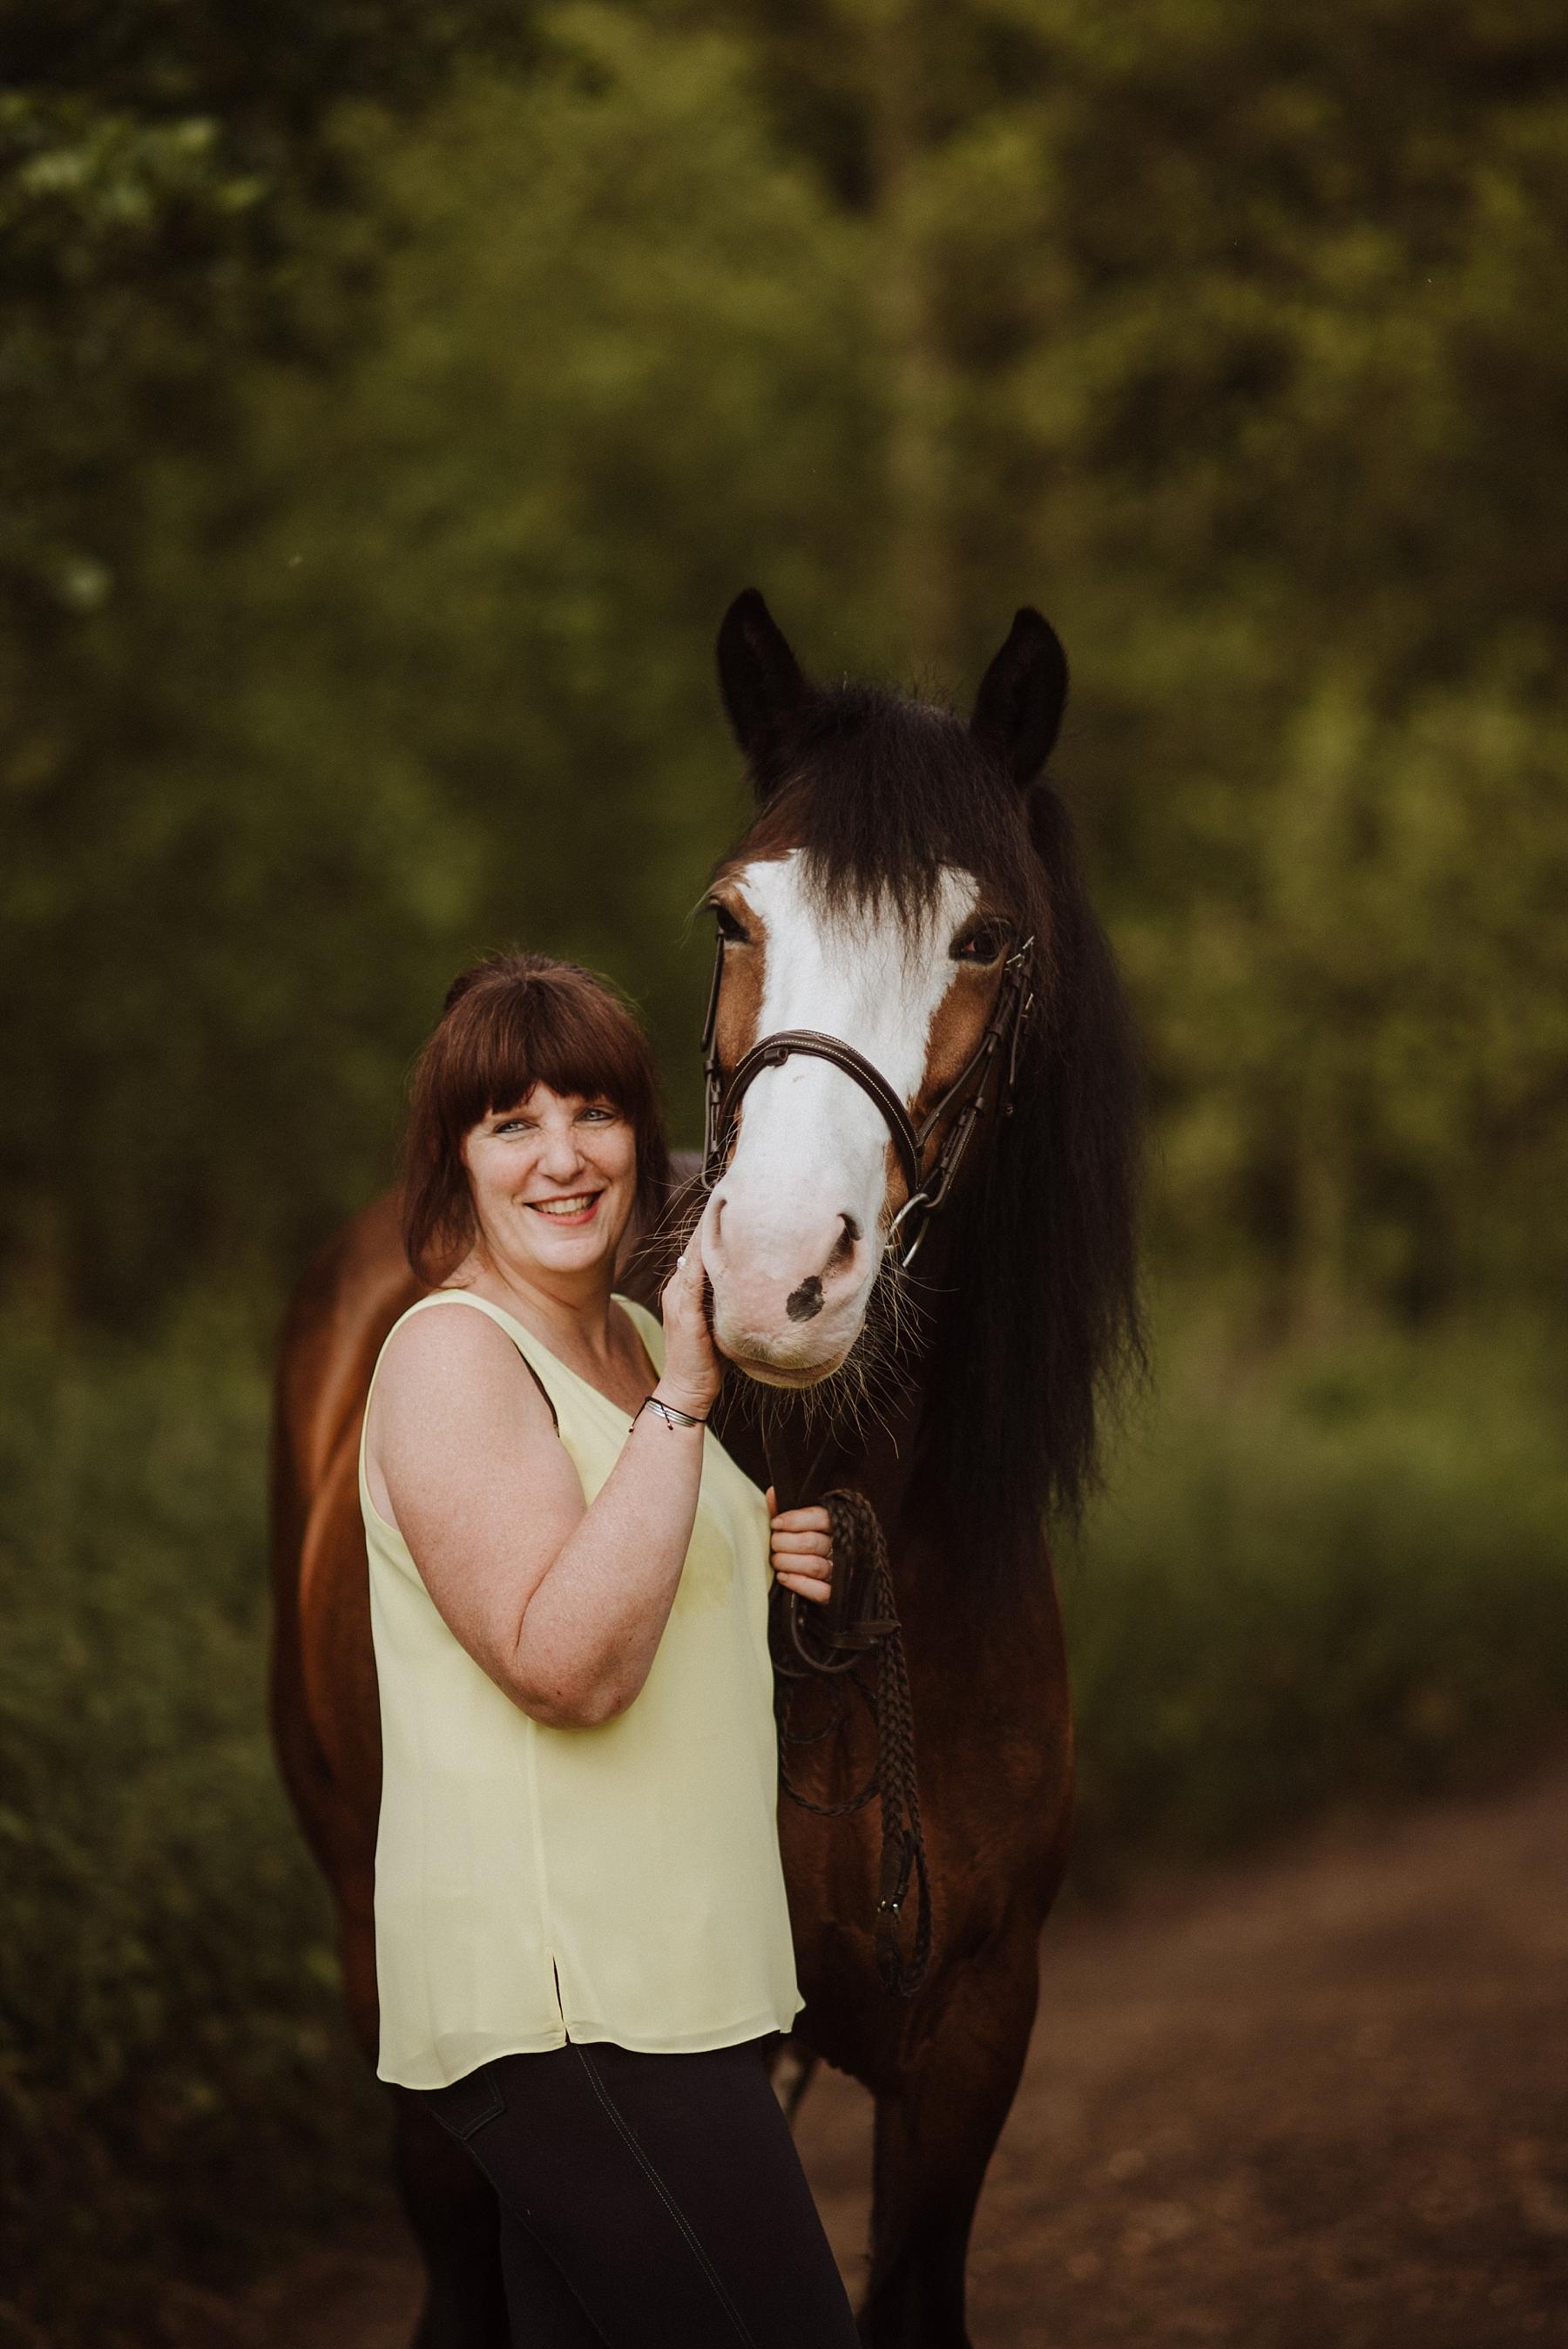 equine photographer in surrey